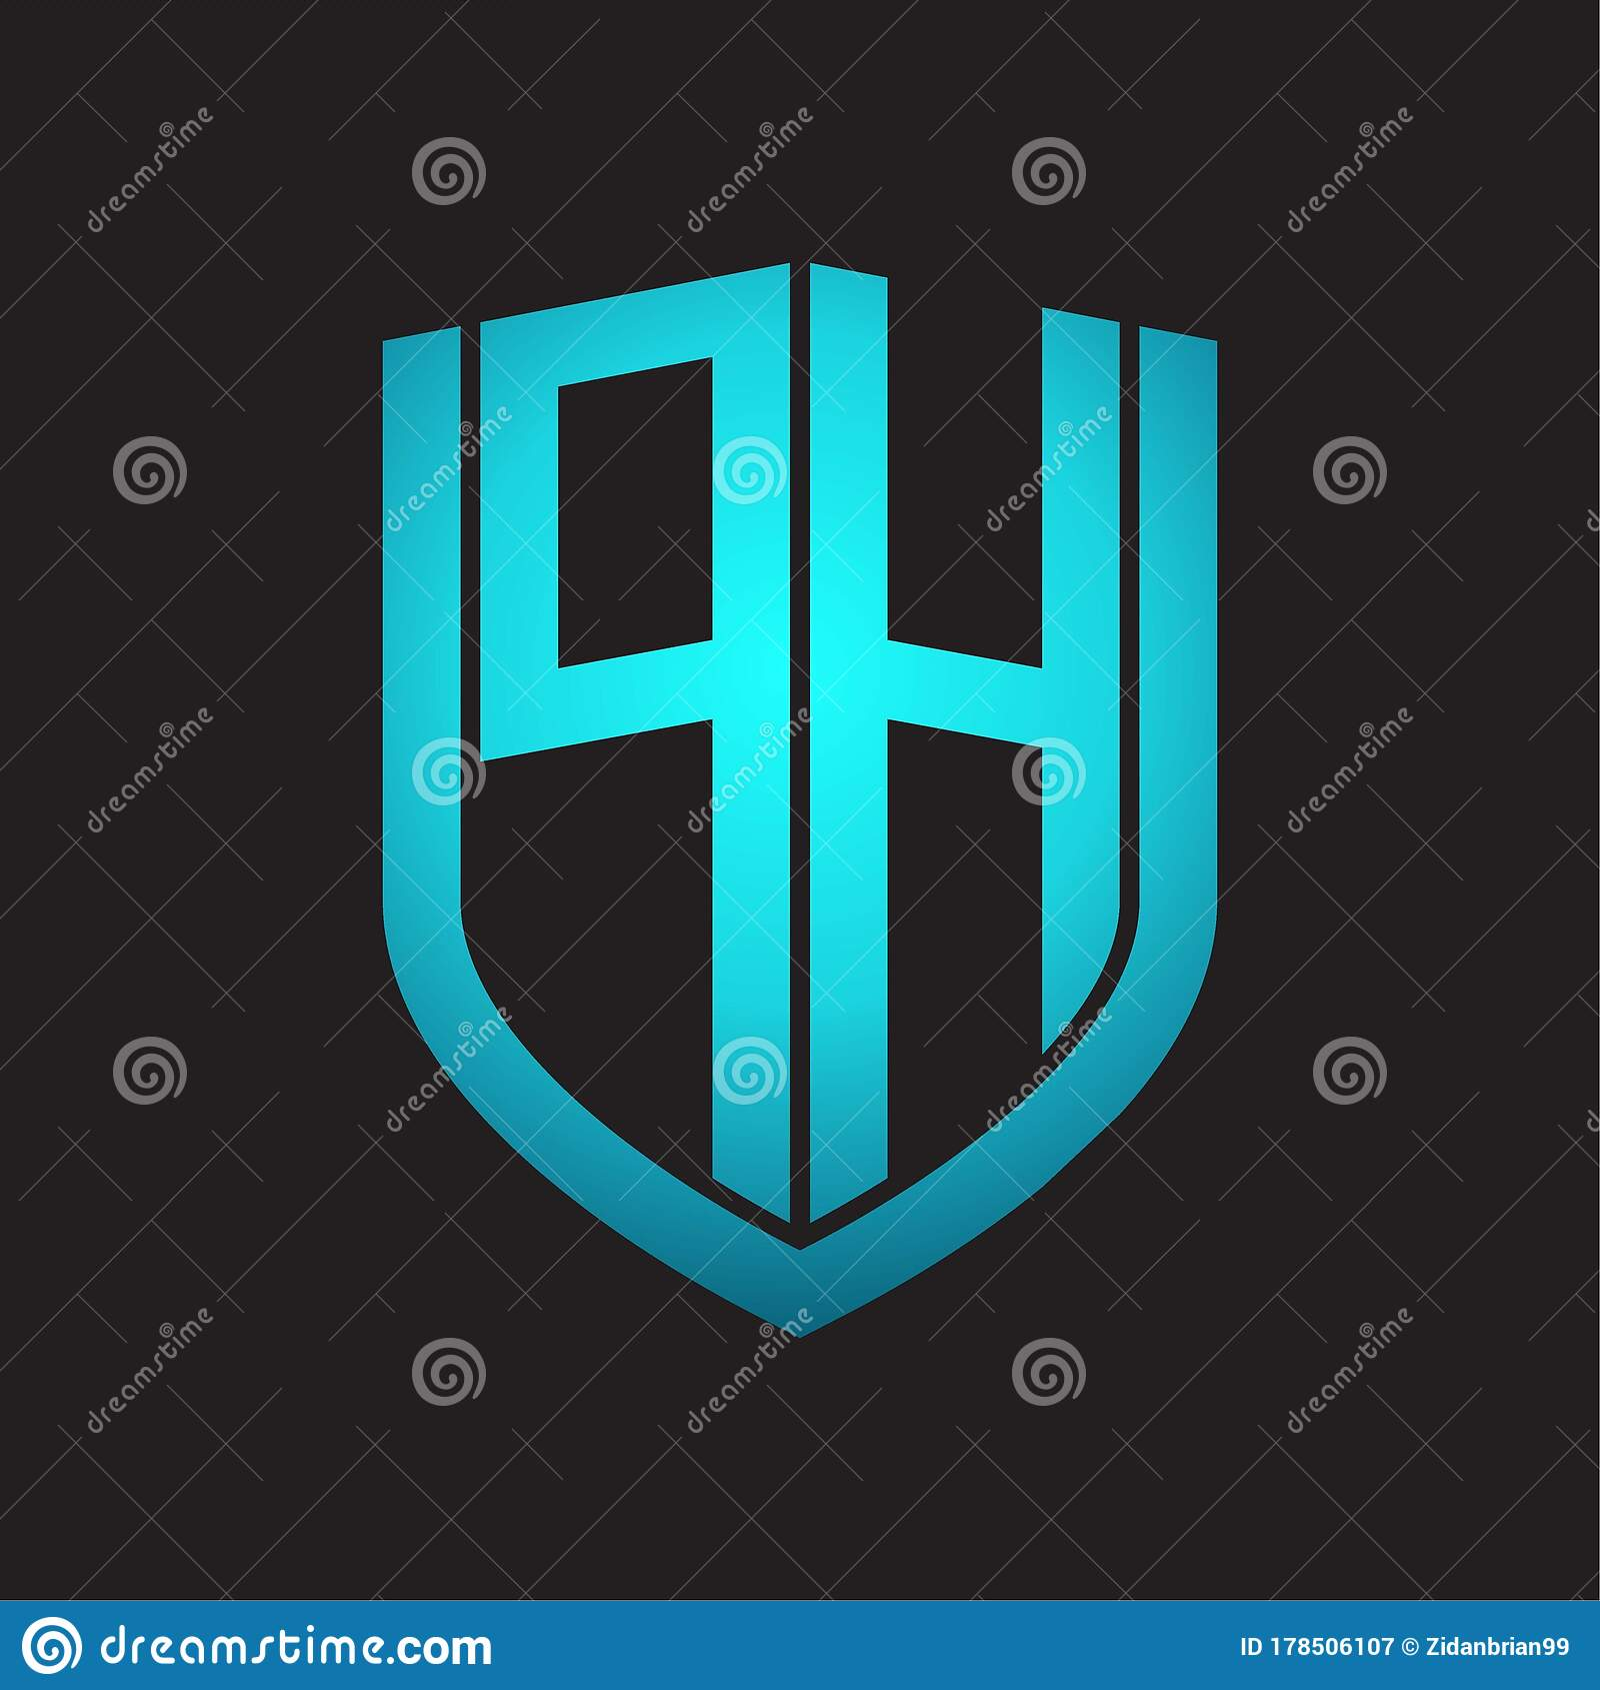 Ph Logo Monogram With Emblem Shield Design Isolated With Blue Colors On Black Background Stock Illustration Illustration Of Identity Creative 178506107